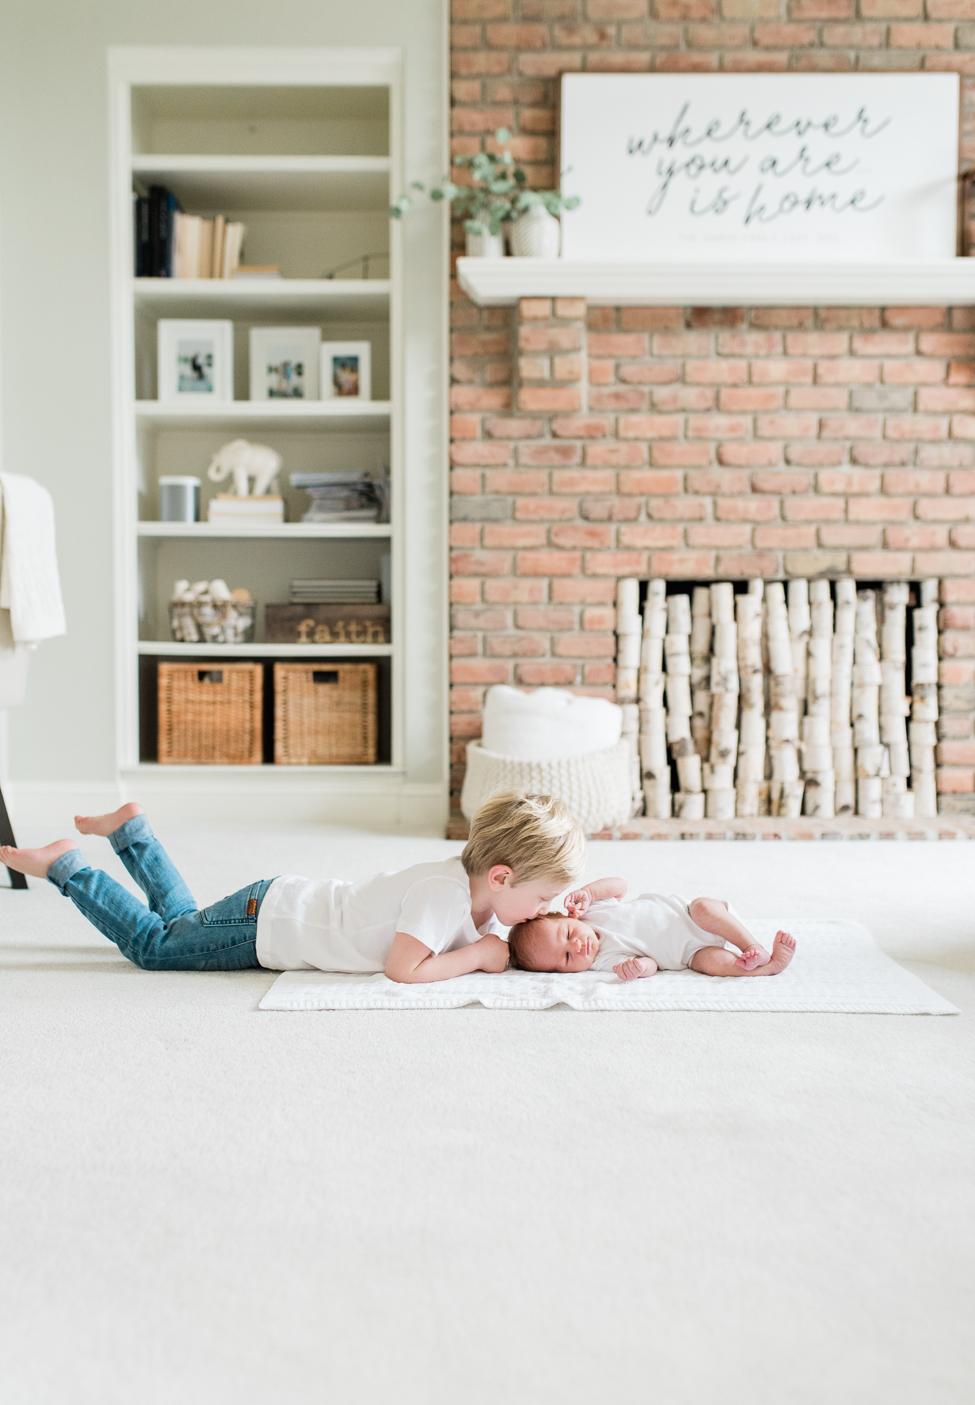 Baltimore-Maryland-lifestyle-newborn-photographer-photos-by-breanna-kuhlmann-#bklp-11.jpg